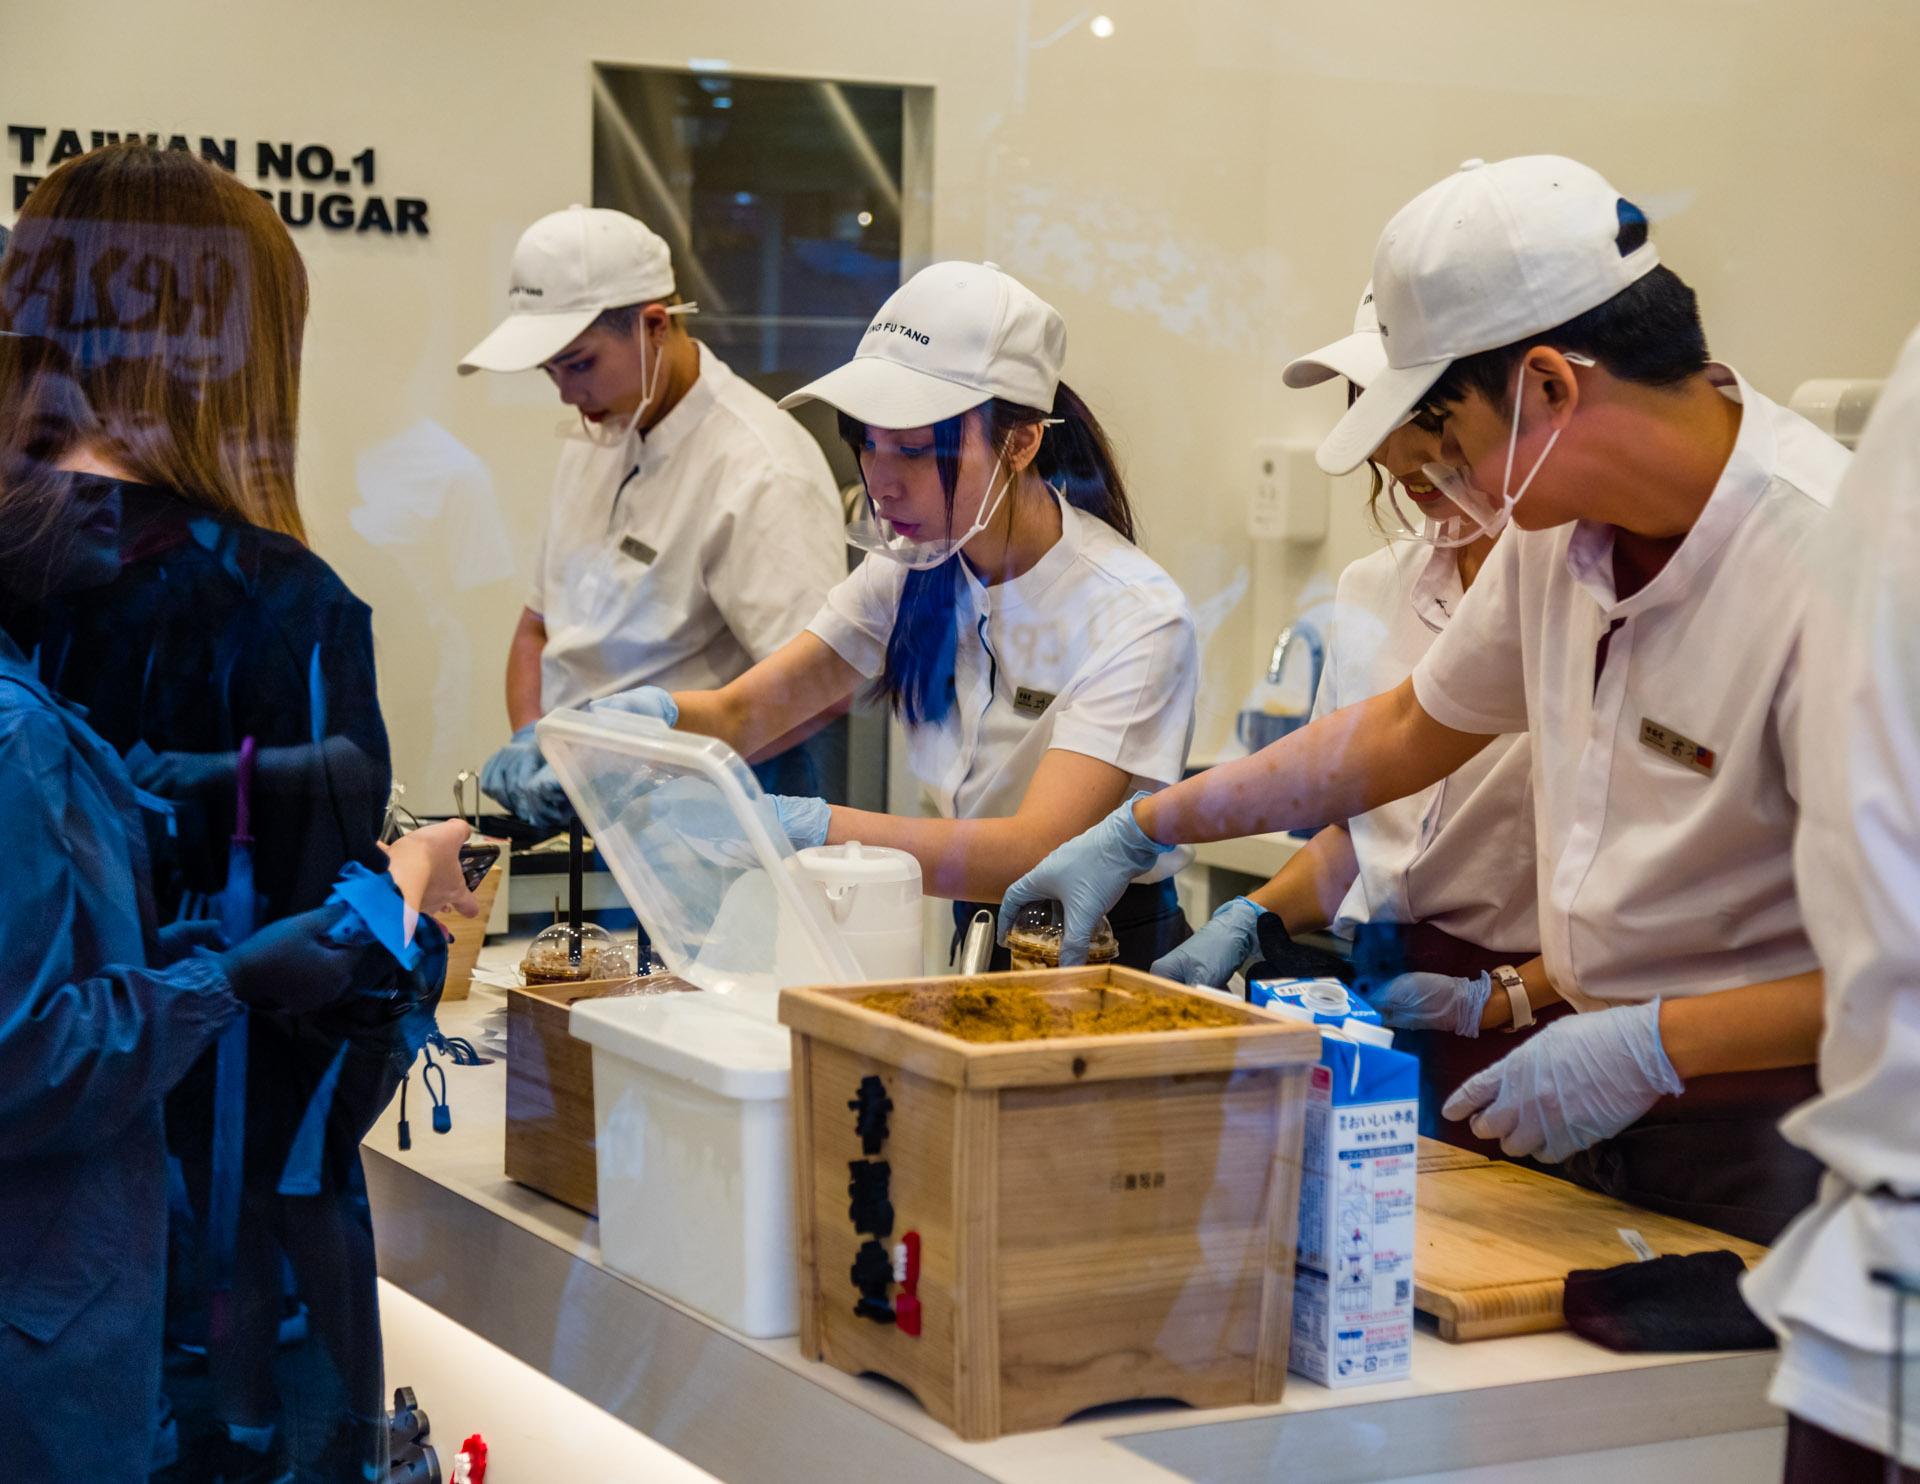 Manufactuers and sellers of Taiwanese Sweets wearing protective masks, Shibuya, Tokyo, Japan